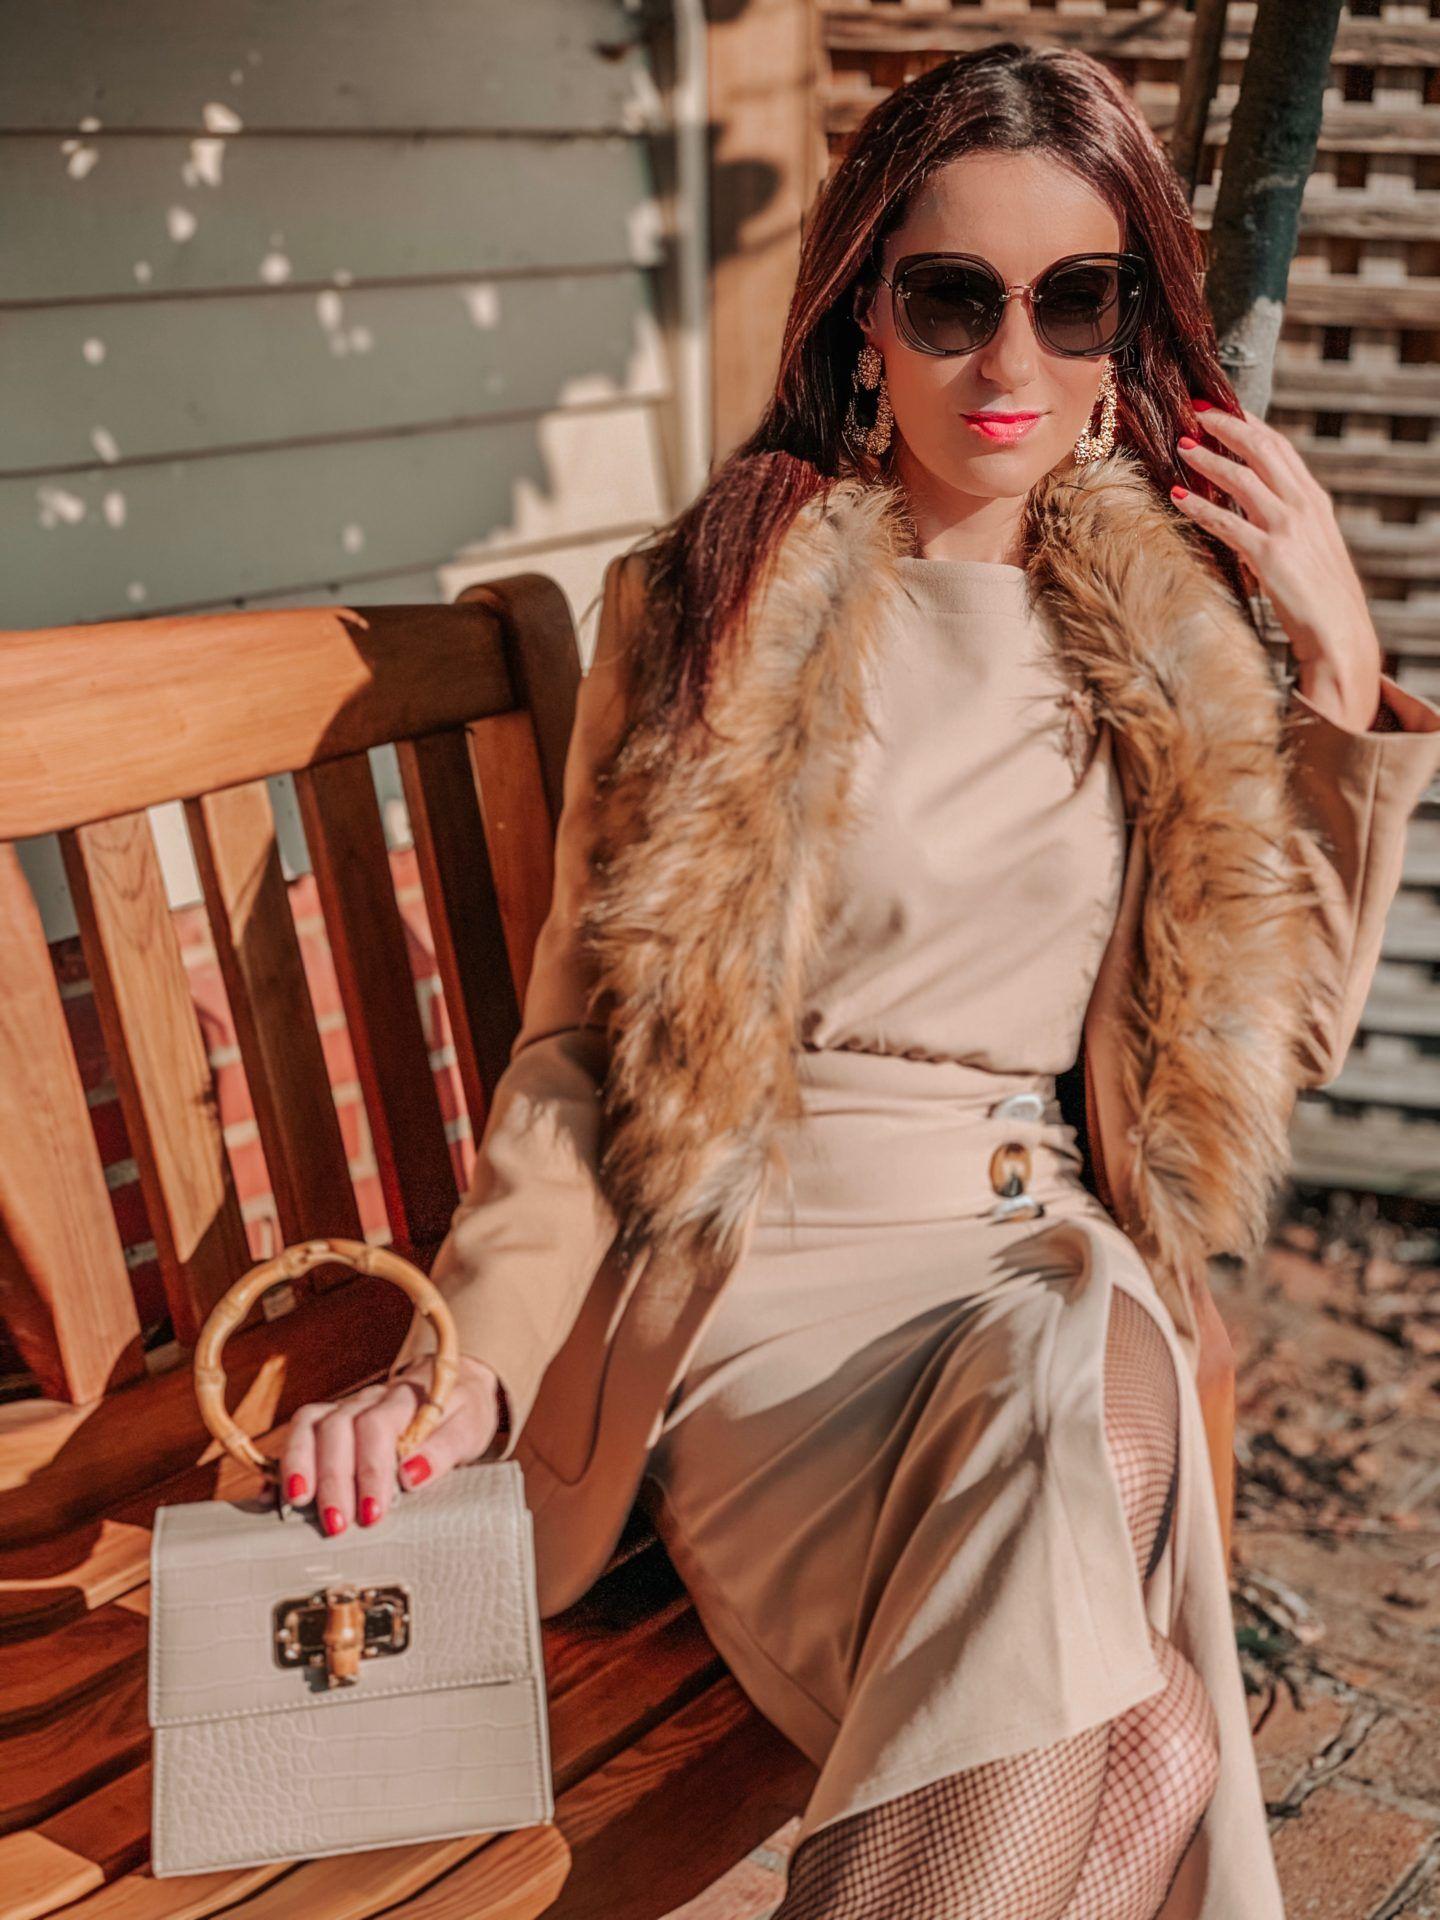 ASOS DESIGN batwing shell button pencil dress | Liars & Lovers cream mock croc bamboo handle cross body bag | Carvela Pointed Asymmetric Strap Heels | MIU MIU Scenique cut-out eyewear | Zara TEXTURED GEOMETRIC EARRINGS | Elegant Duchess Boutique Brooch